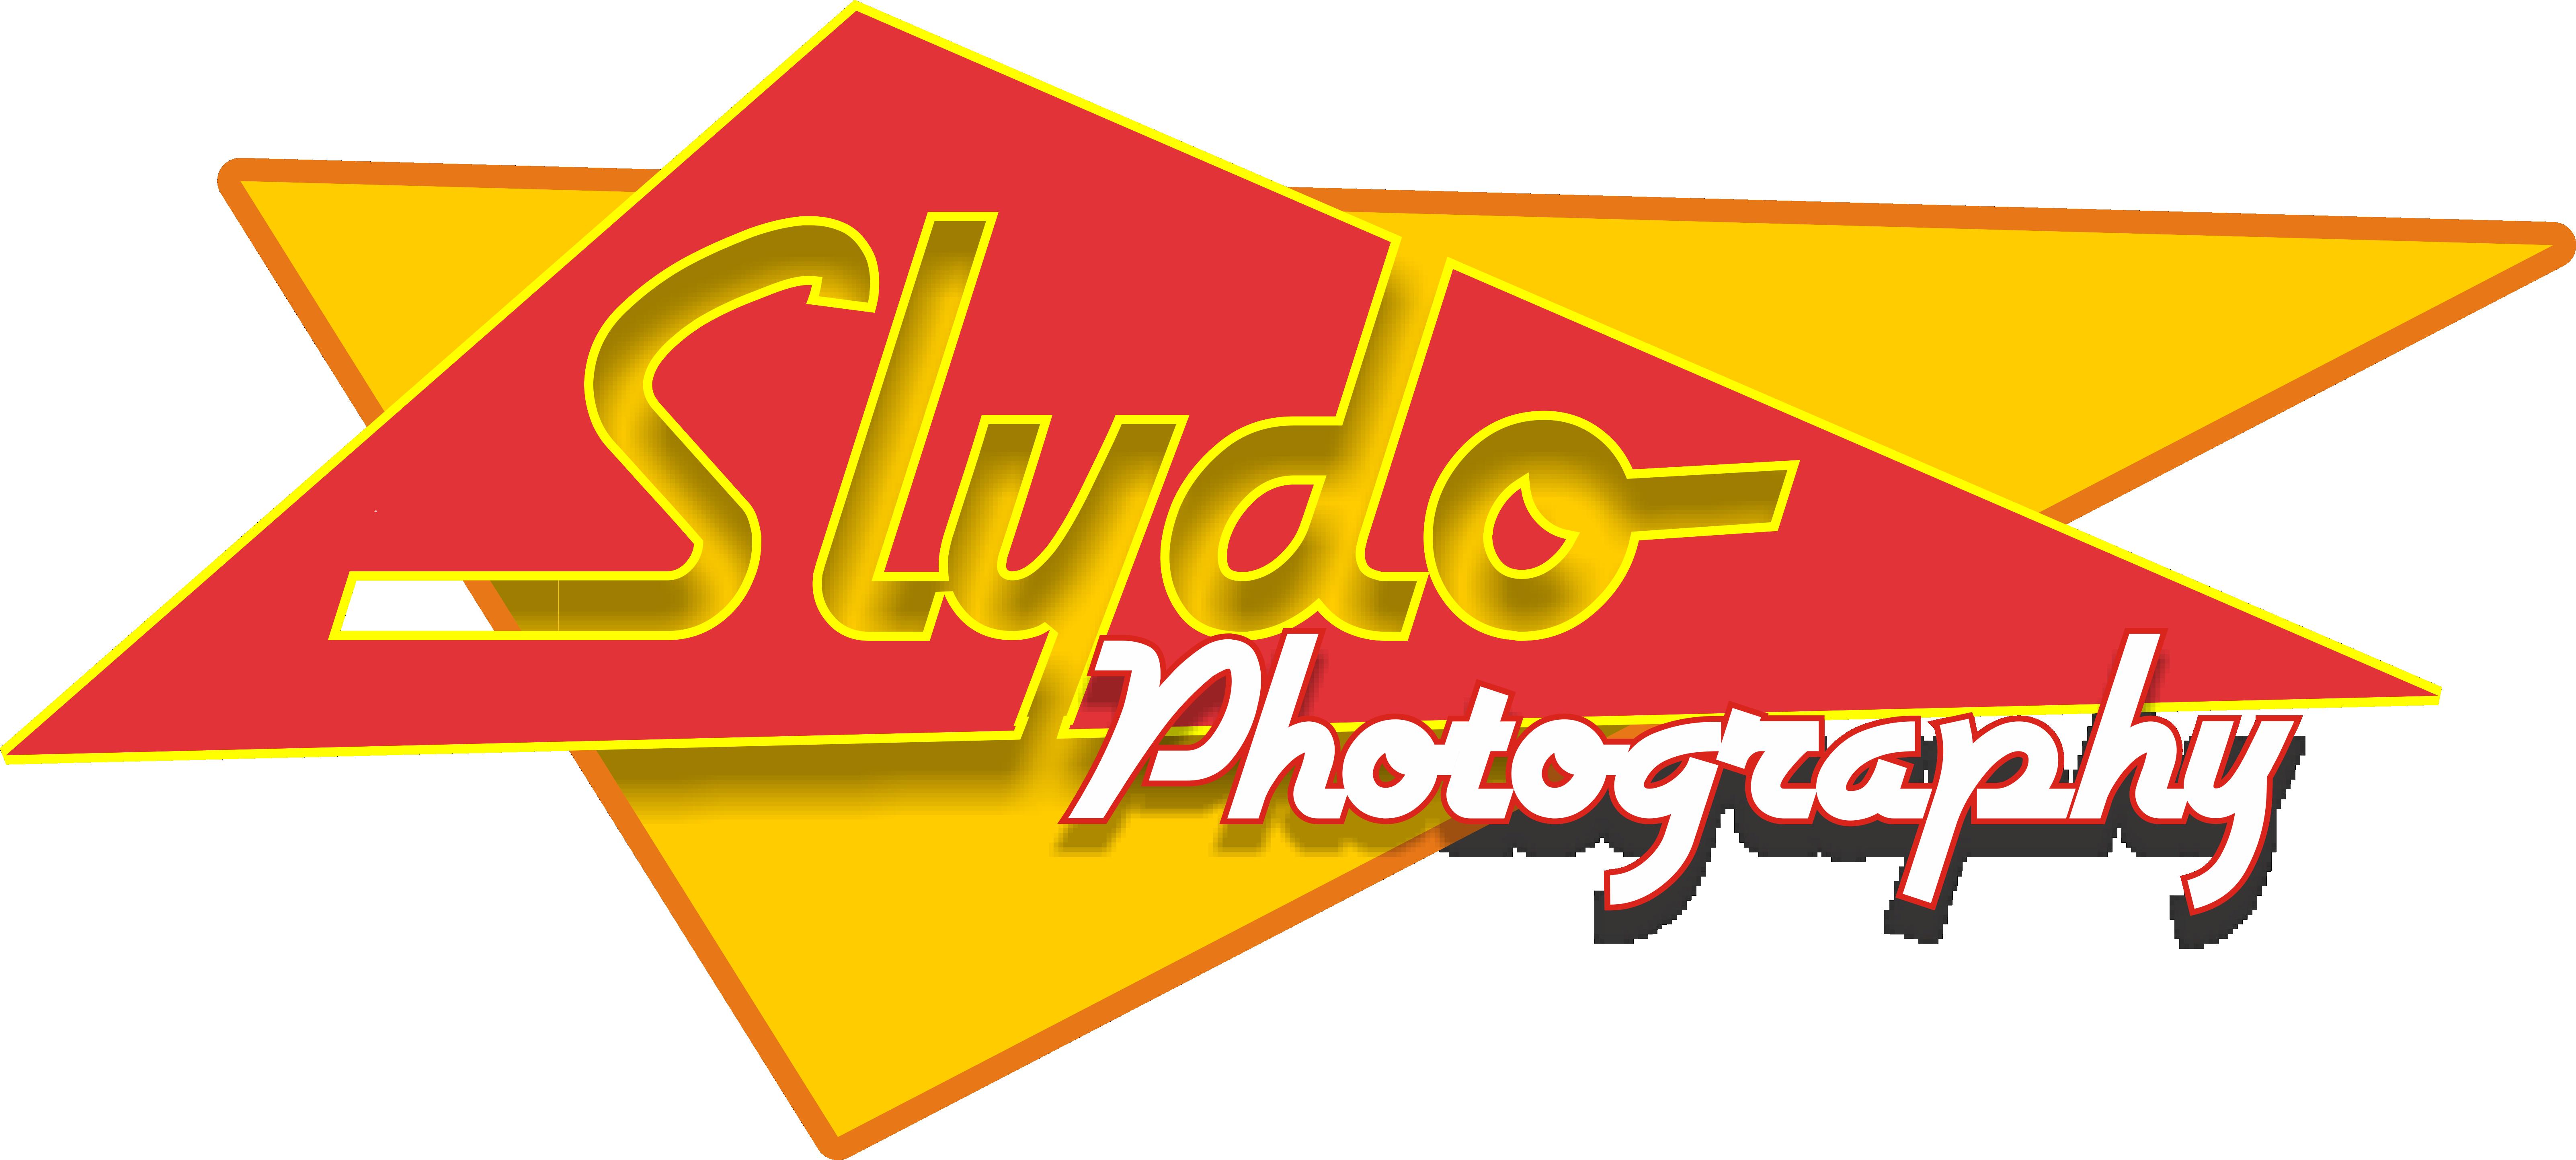 List of Photographers in Warri Delta - Finelib com